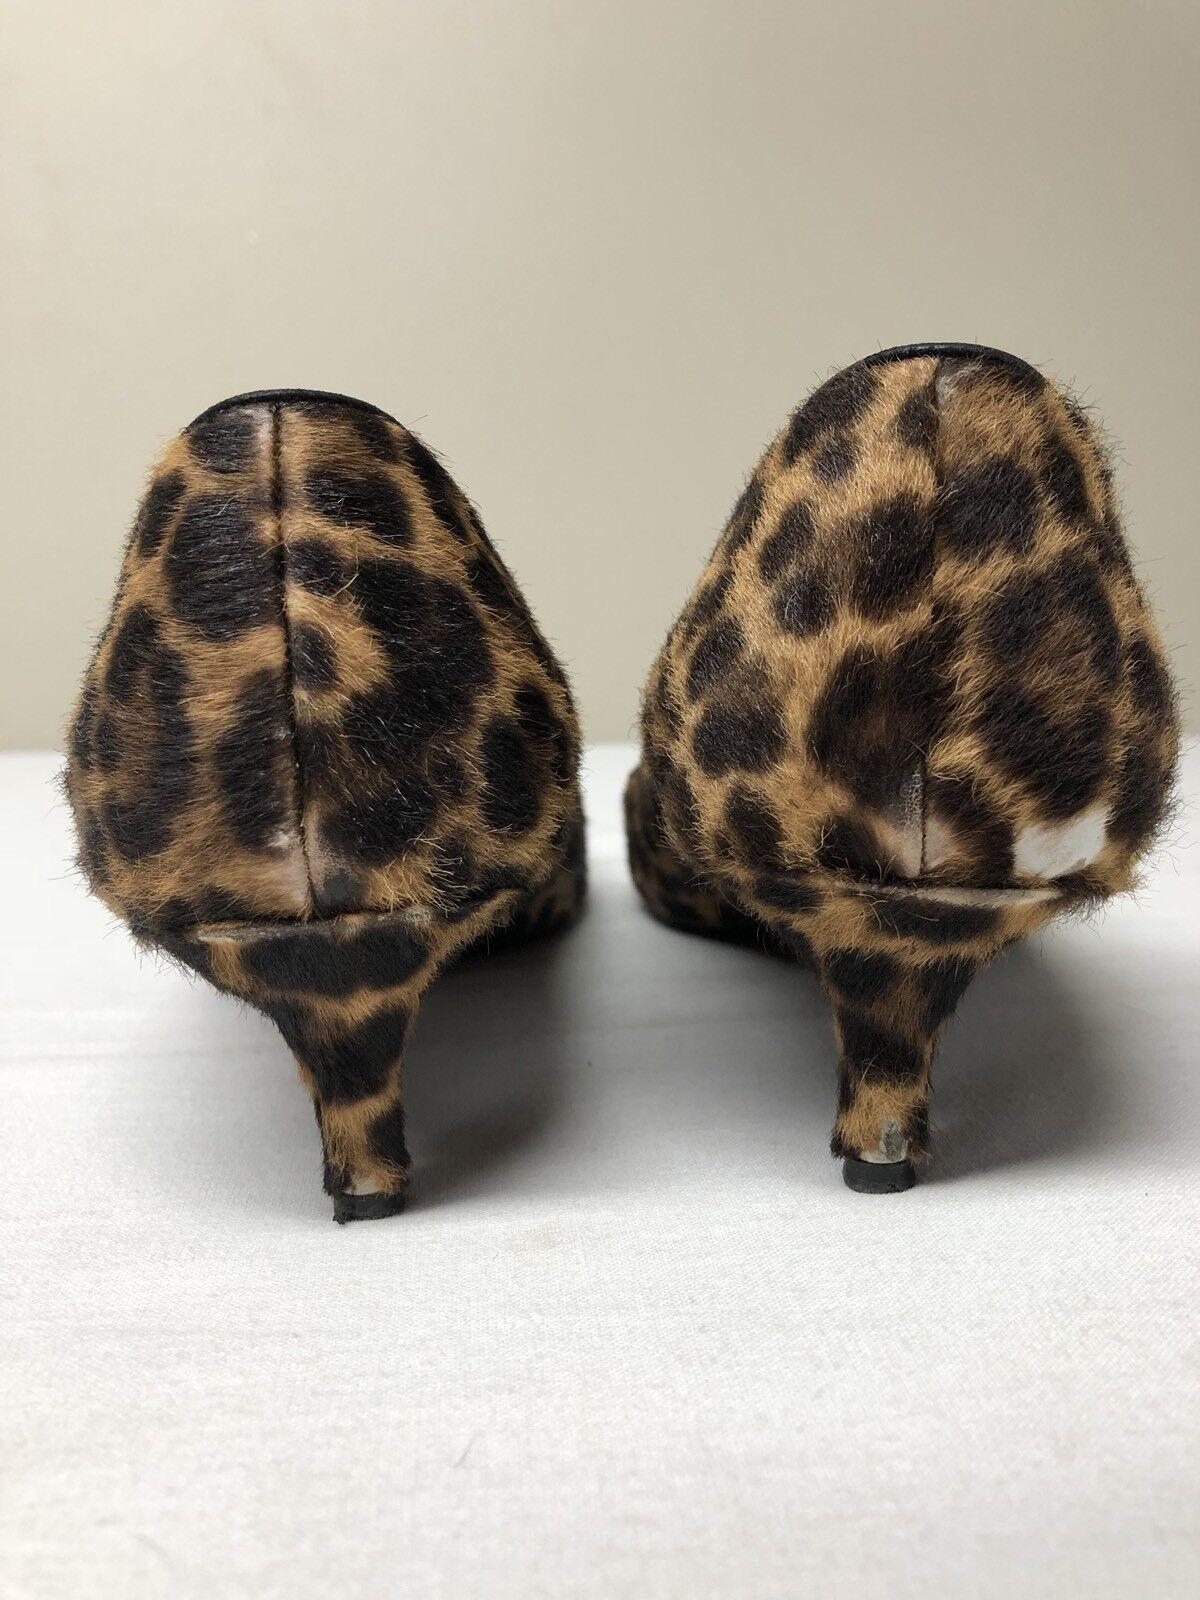 Prada Toe Leopard Calfskin Pointed Toe Prada Kitten Heel Pumps EU 37 US 7 cbb9be